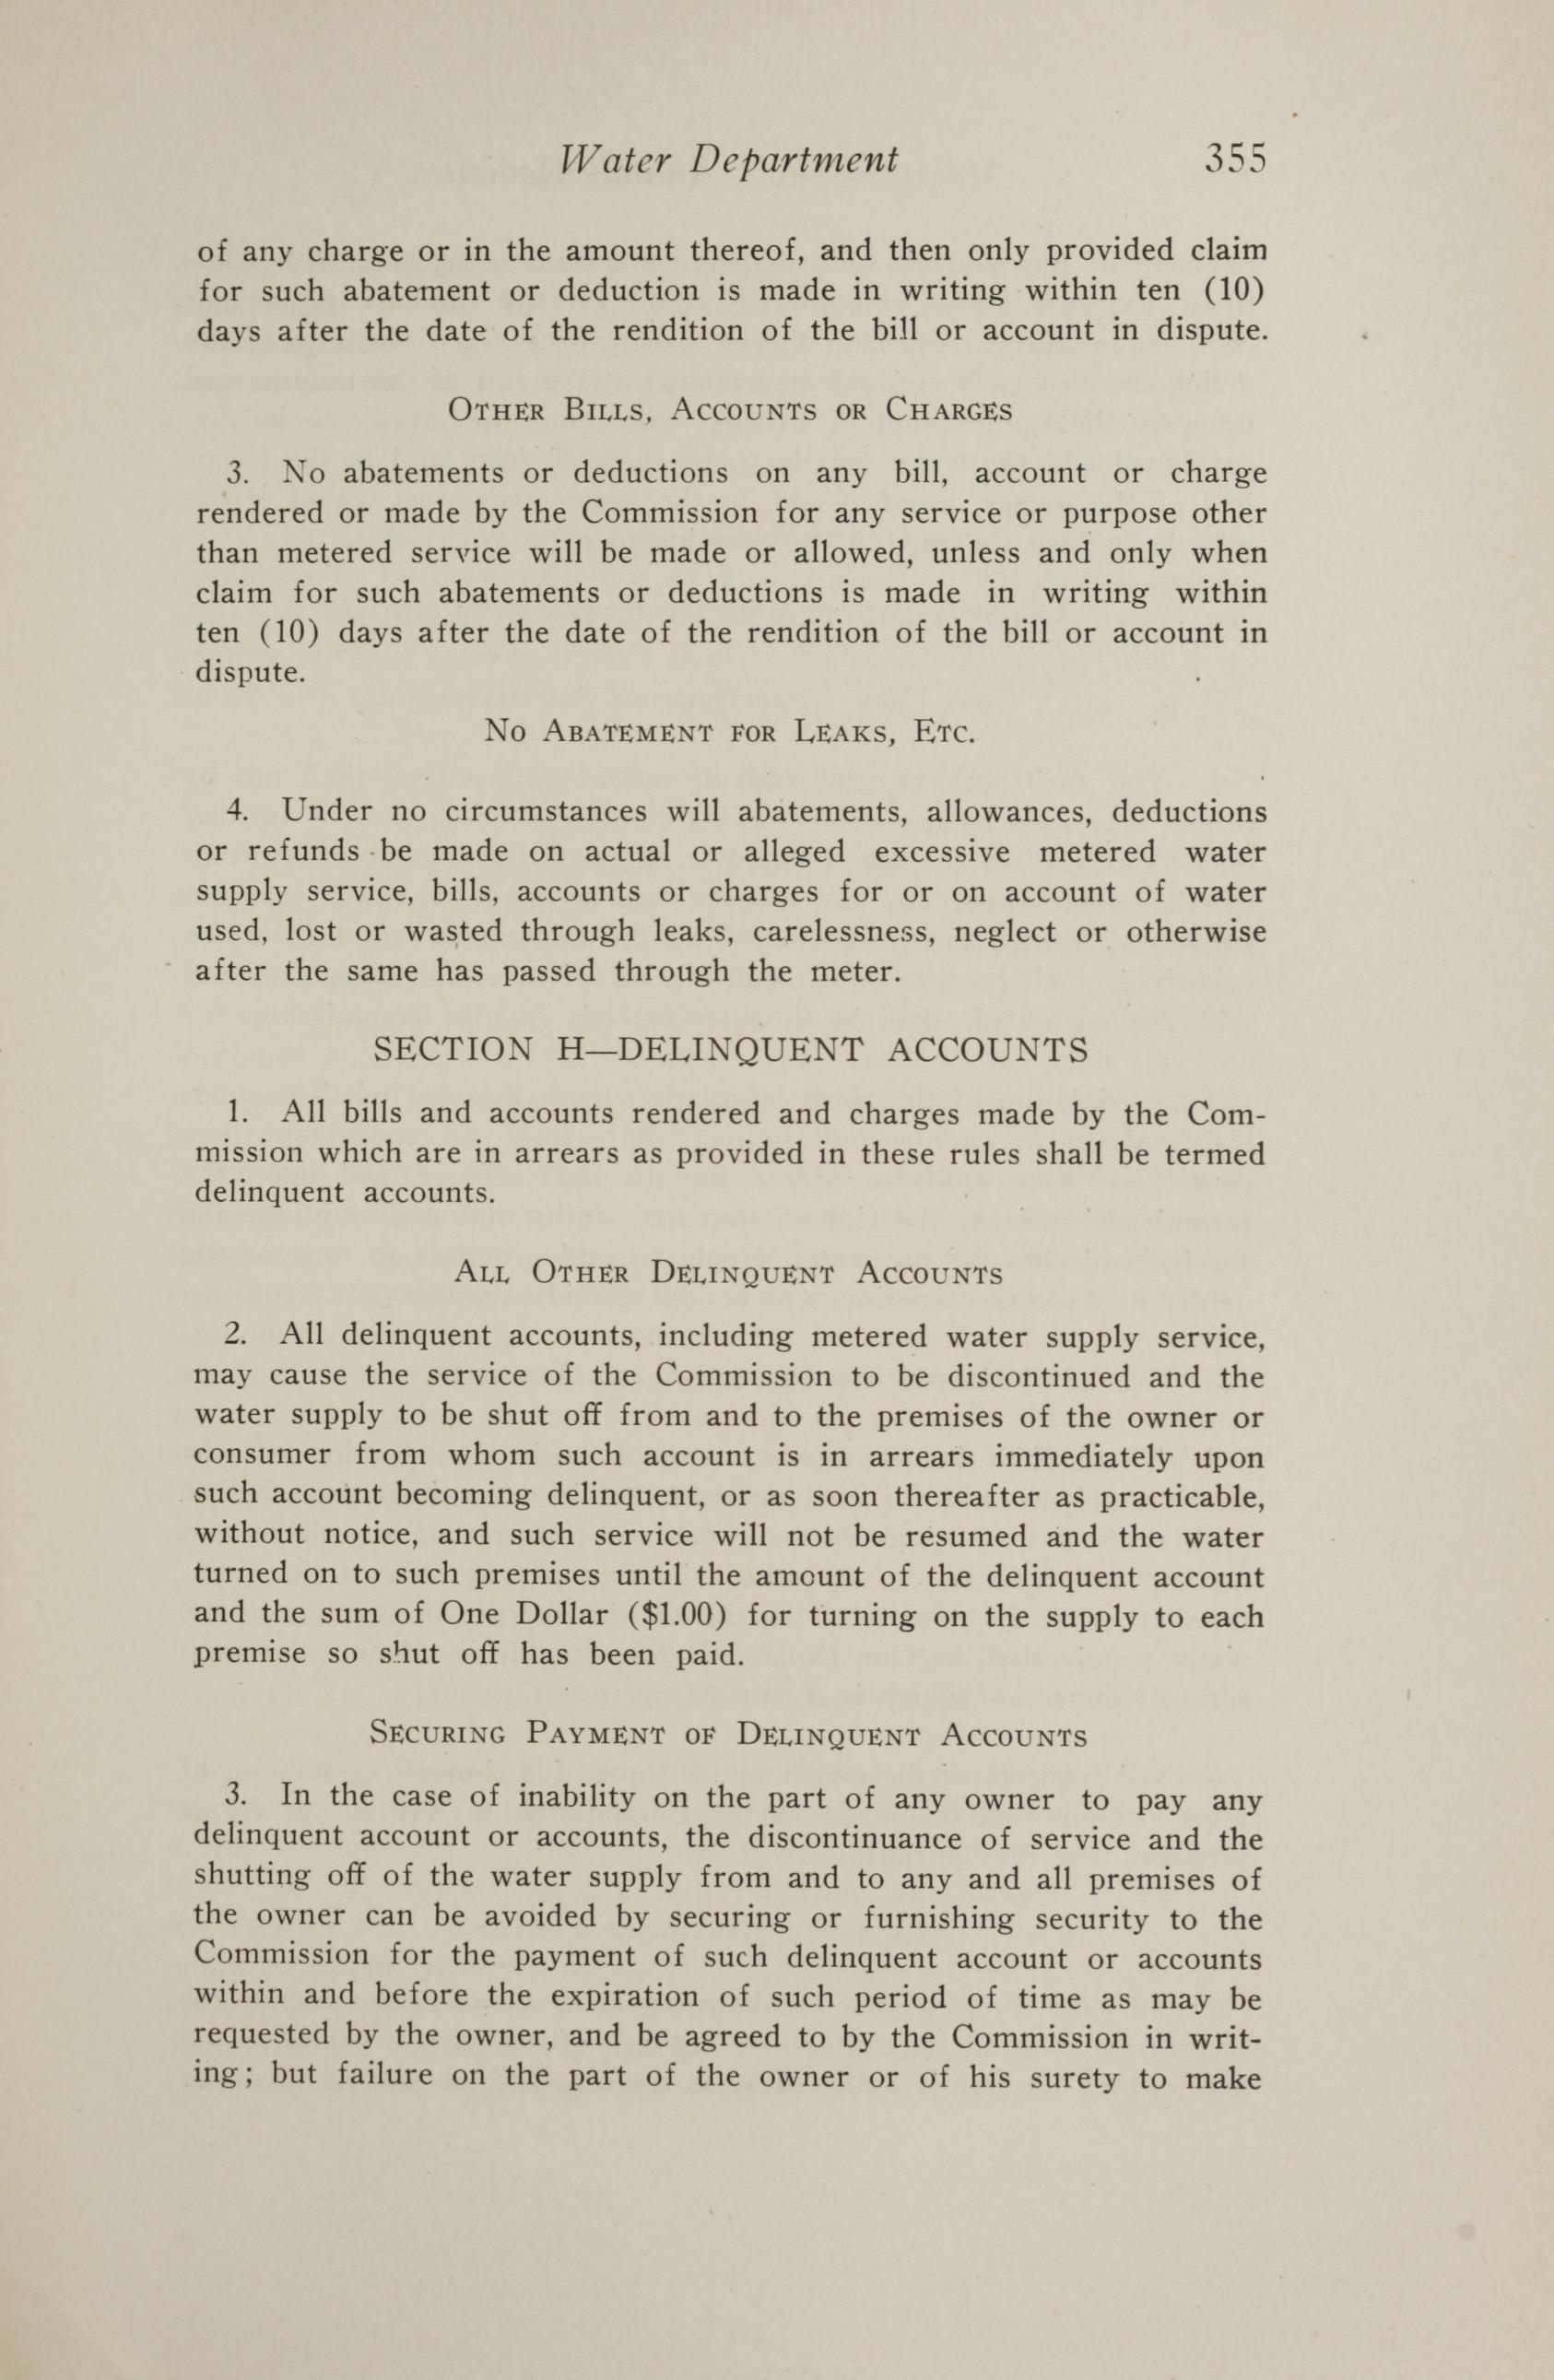 Charleston Yearbook, 1917, page 355